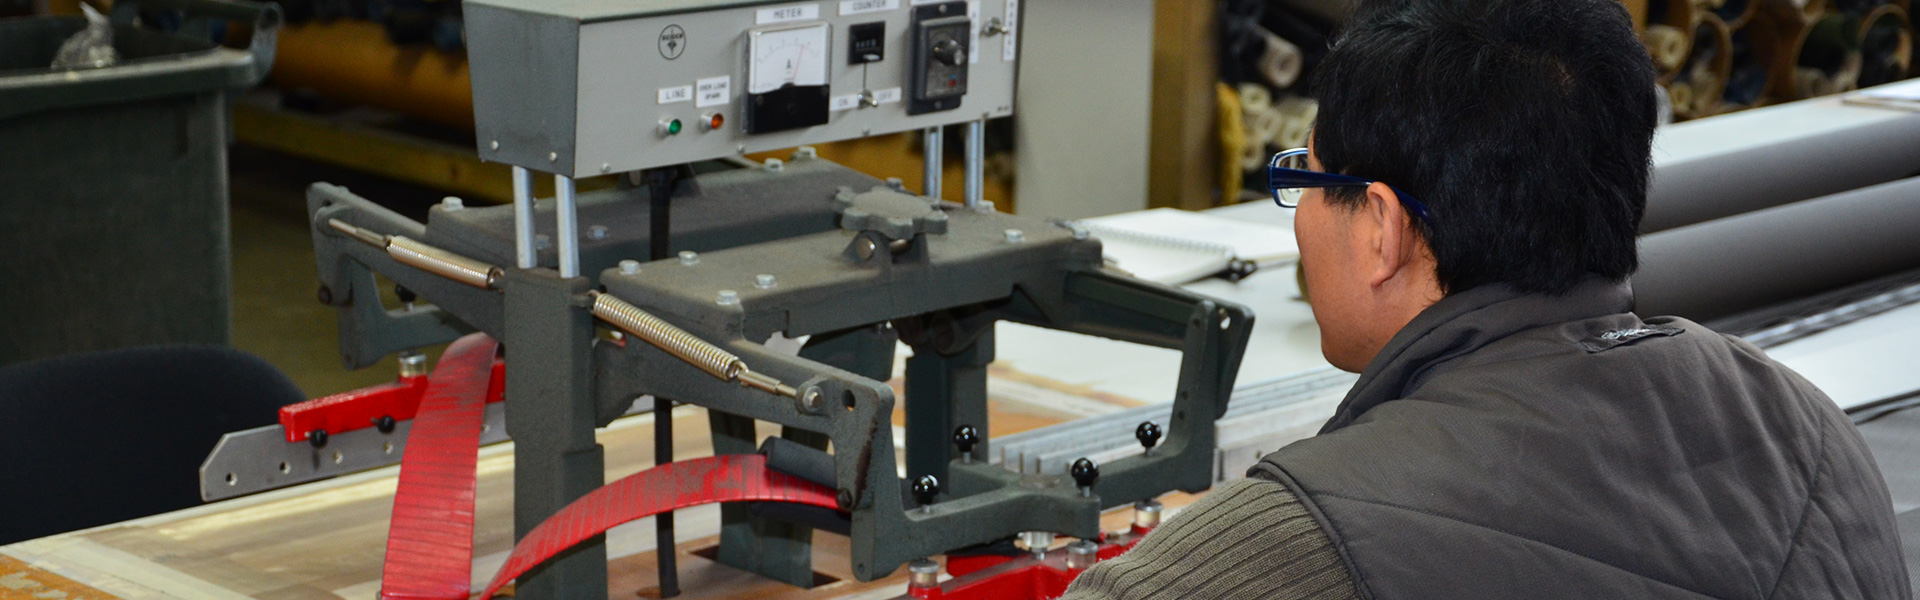 Outdoor Blinds Manufacturer Adelaide | Inviron Blinds Adelaide